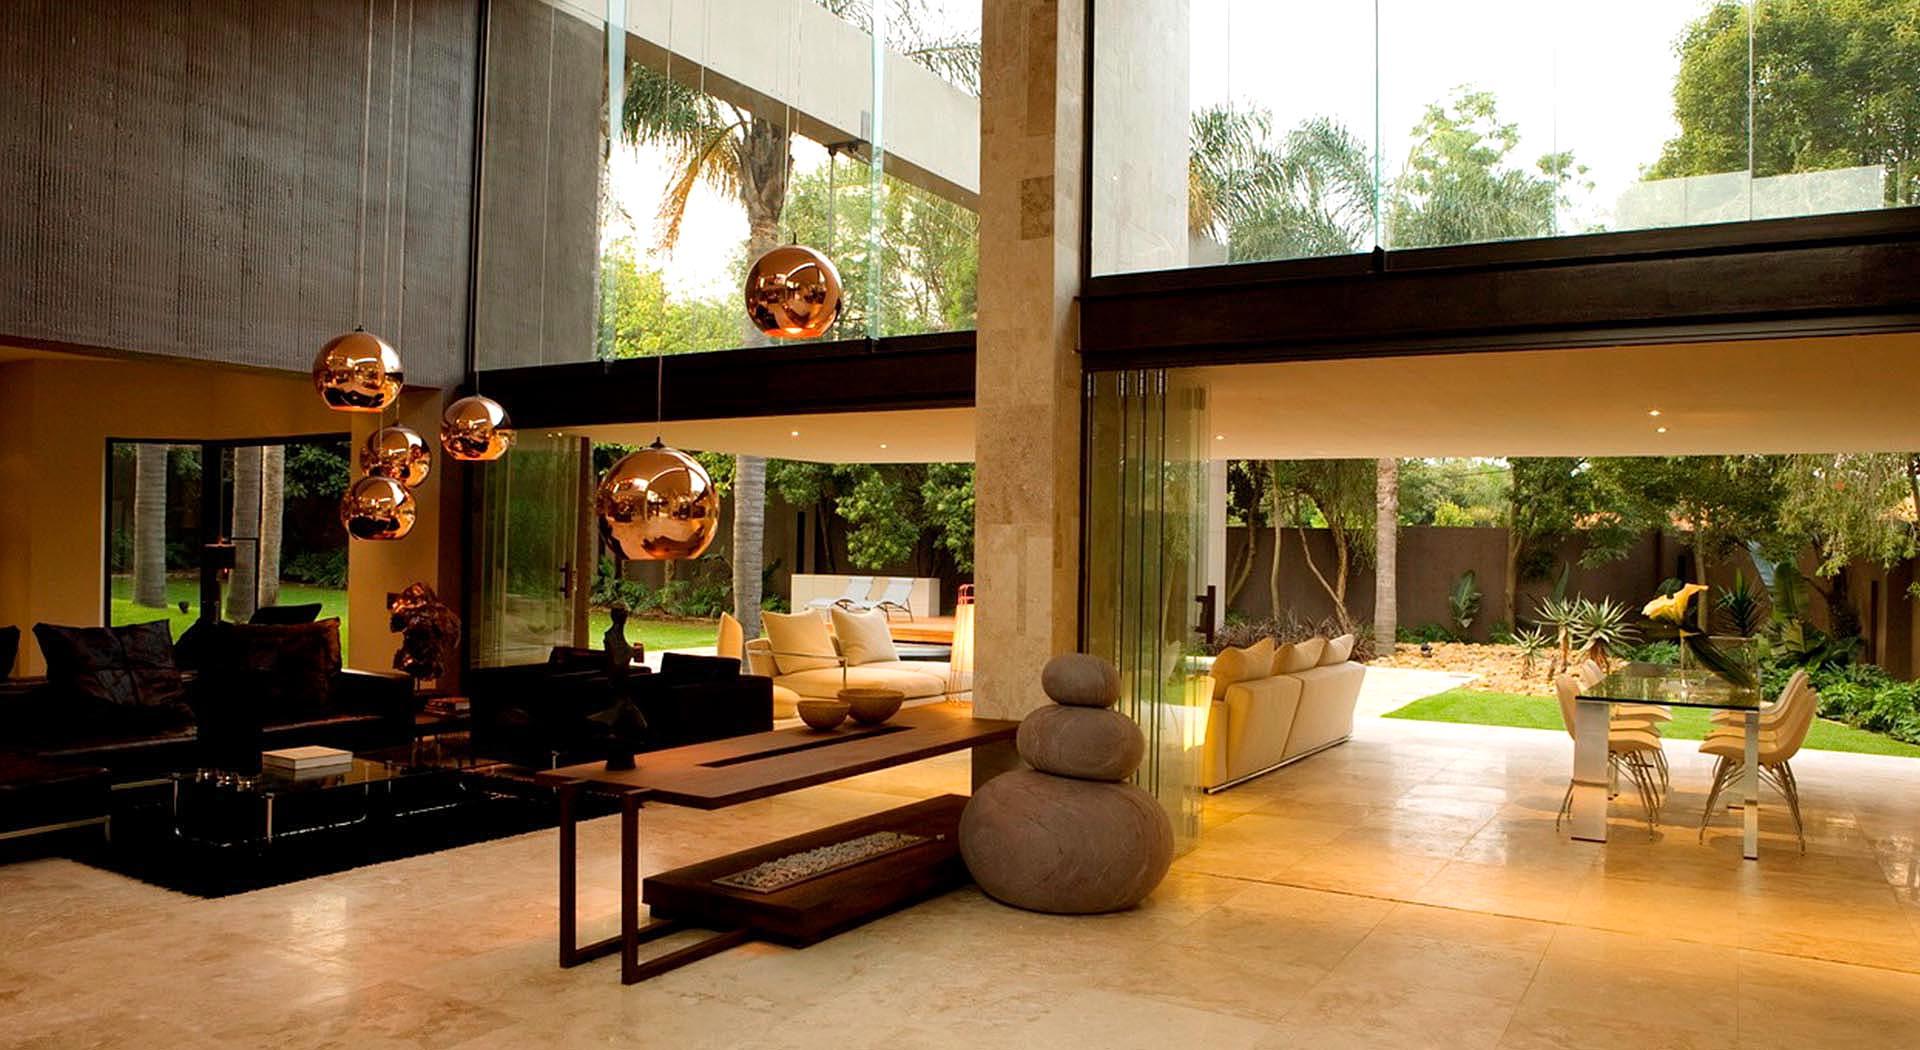 Total renovation by Nico van der Meulen Architects